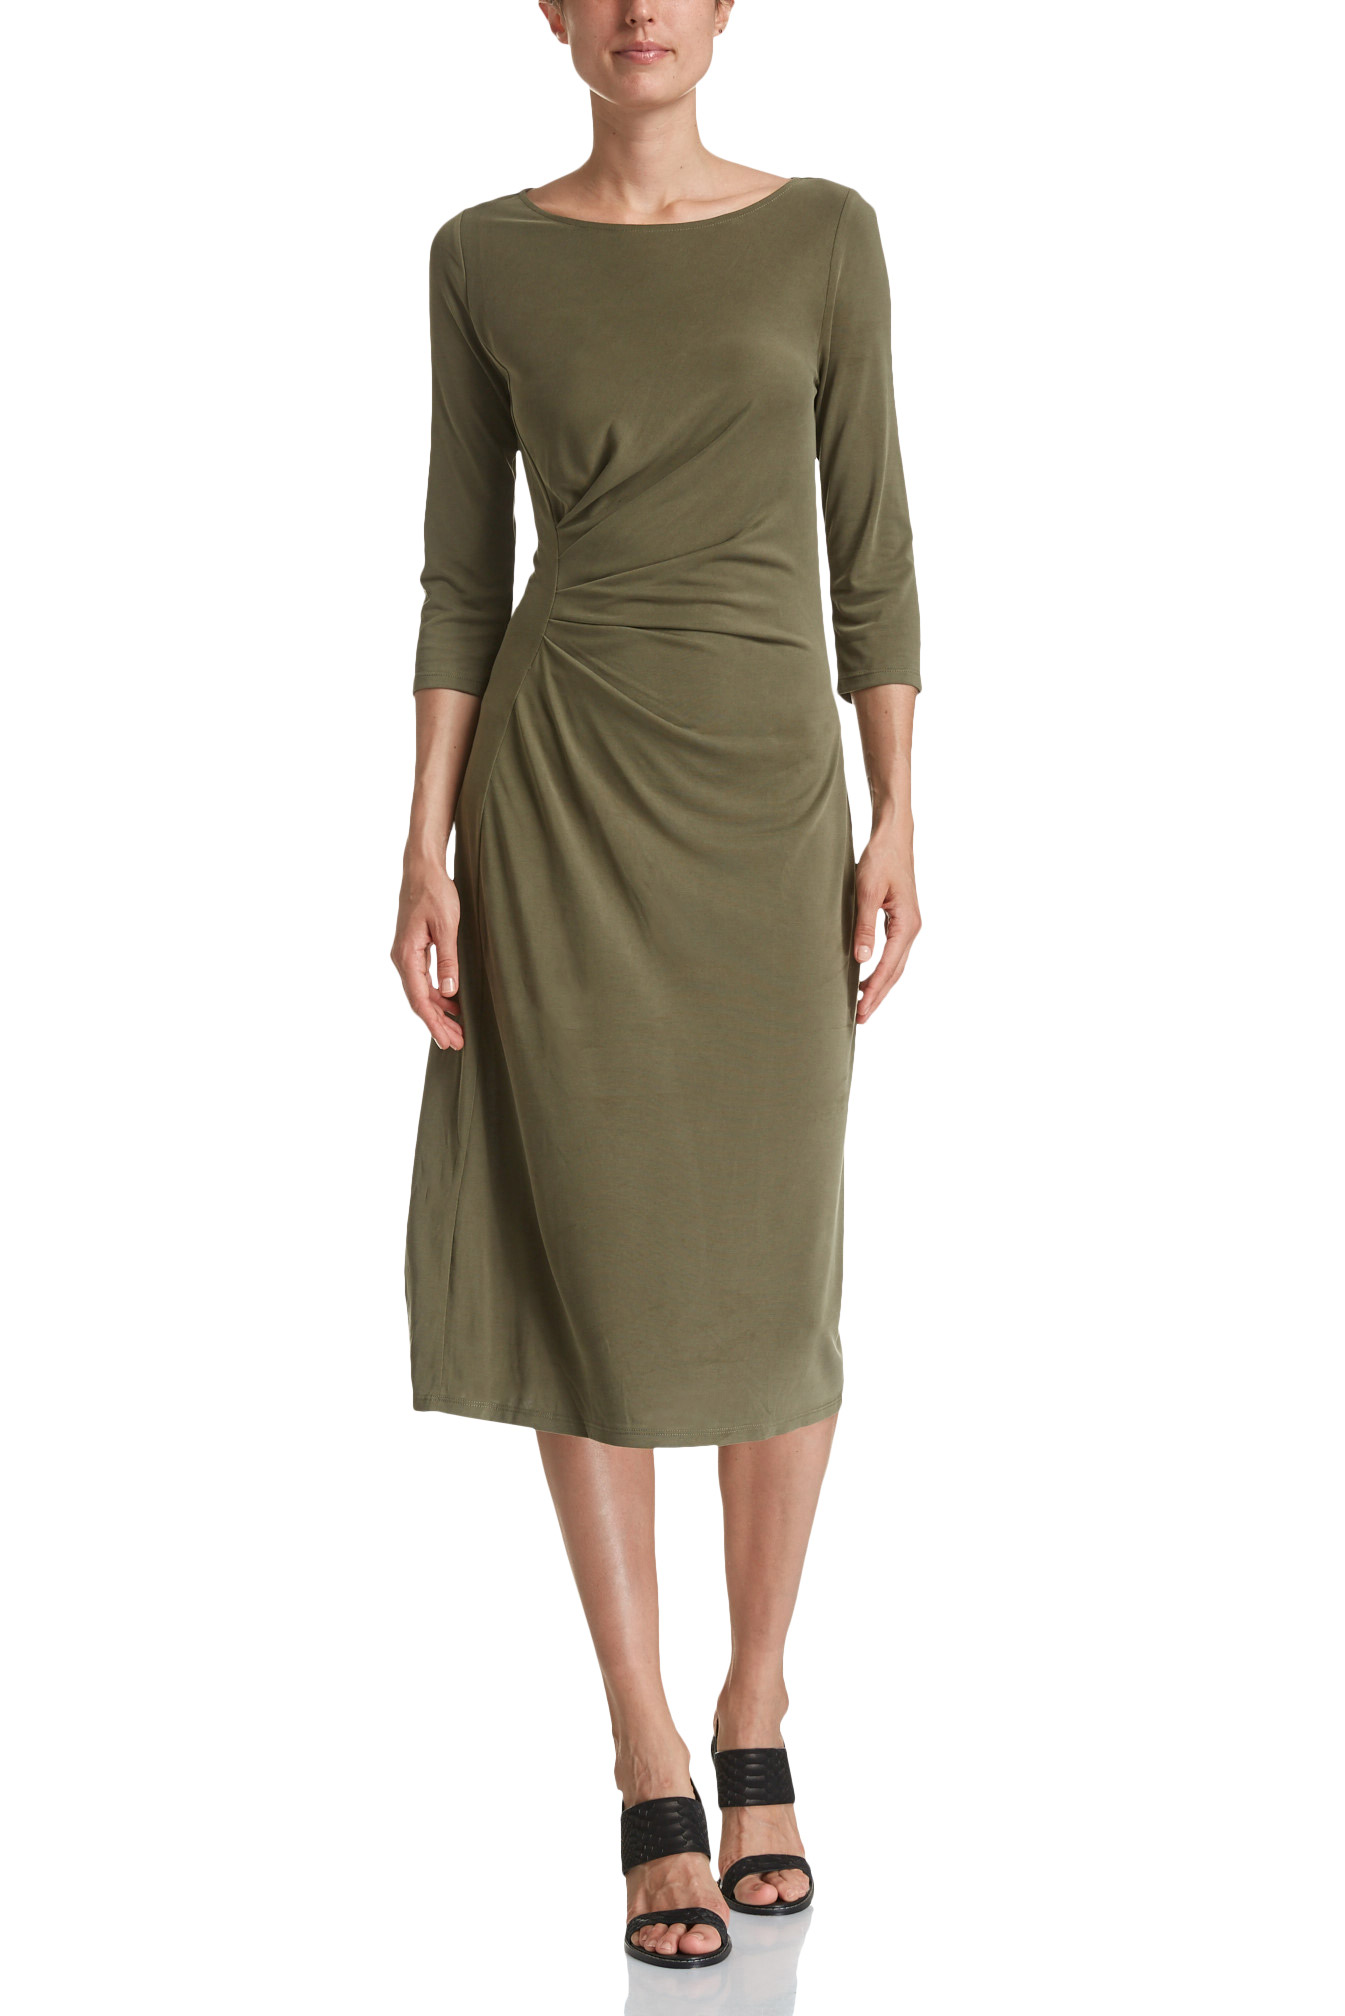 Saba Penelope Drape Dress